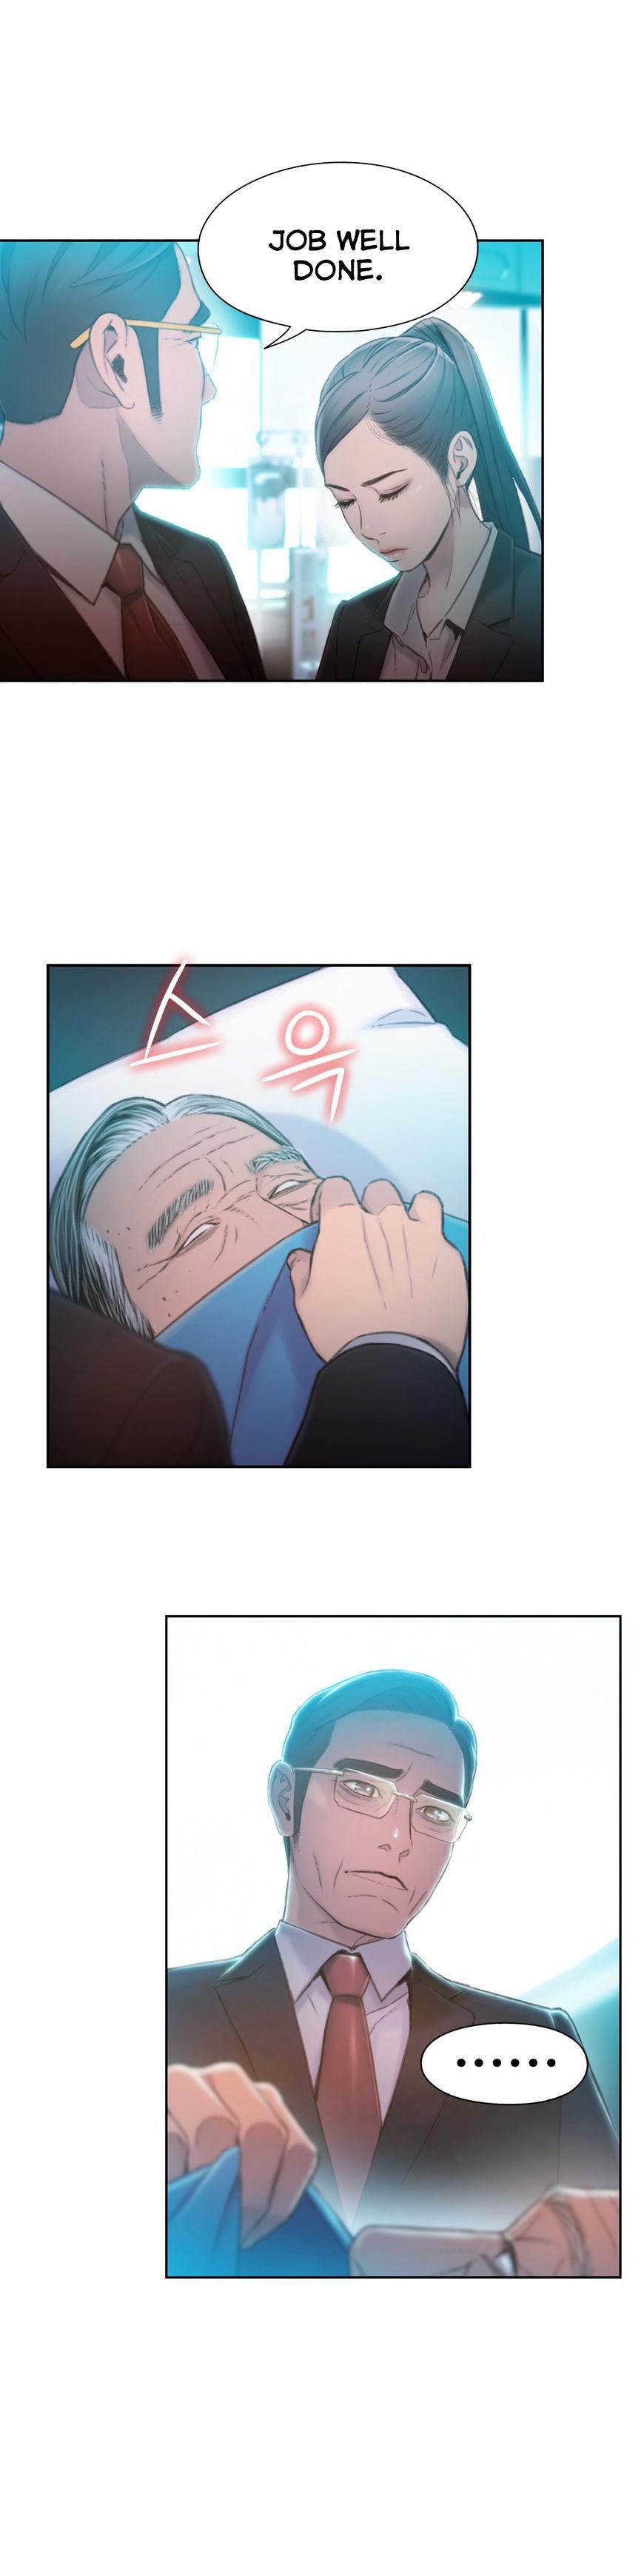 Sweet Guy Chapter 73 Full Manga Read Scan Image 10